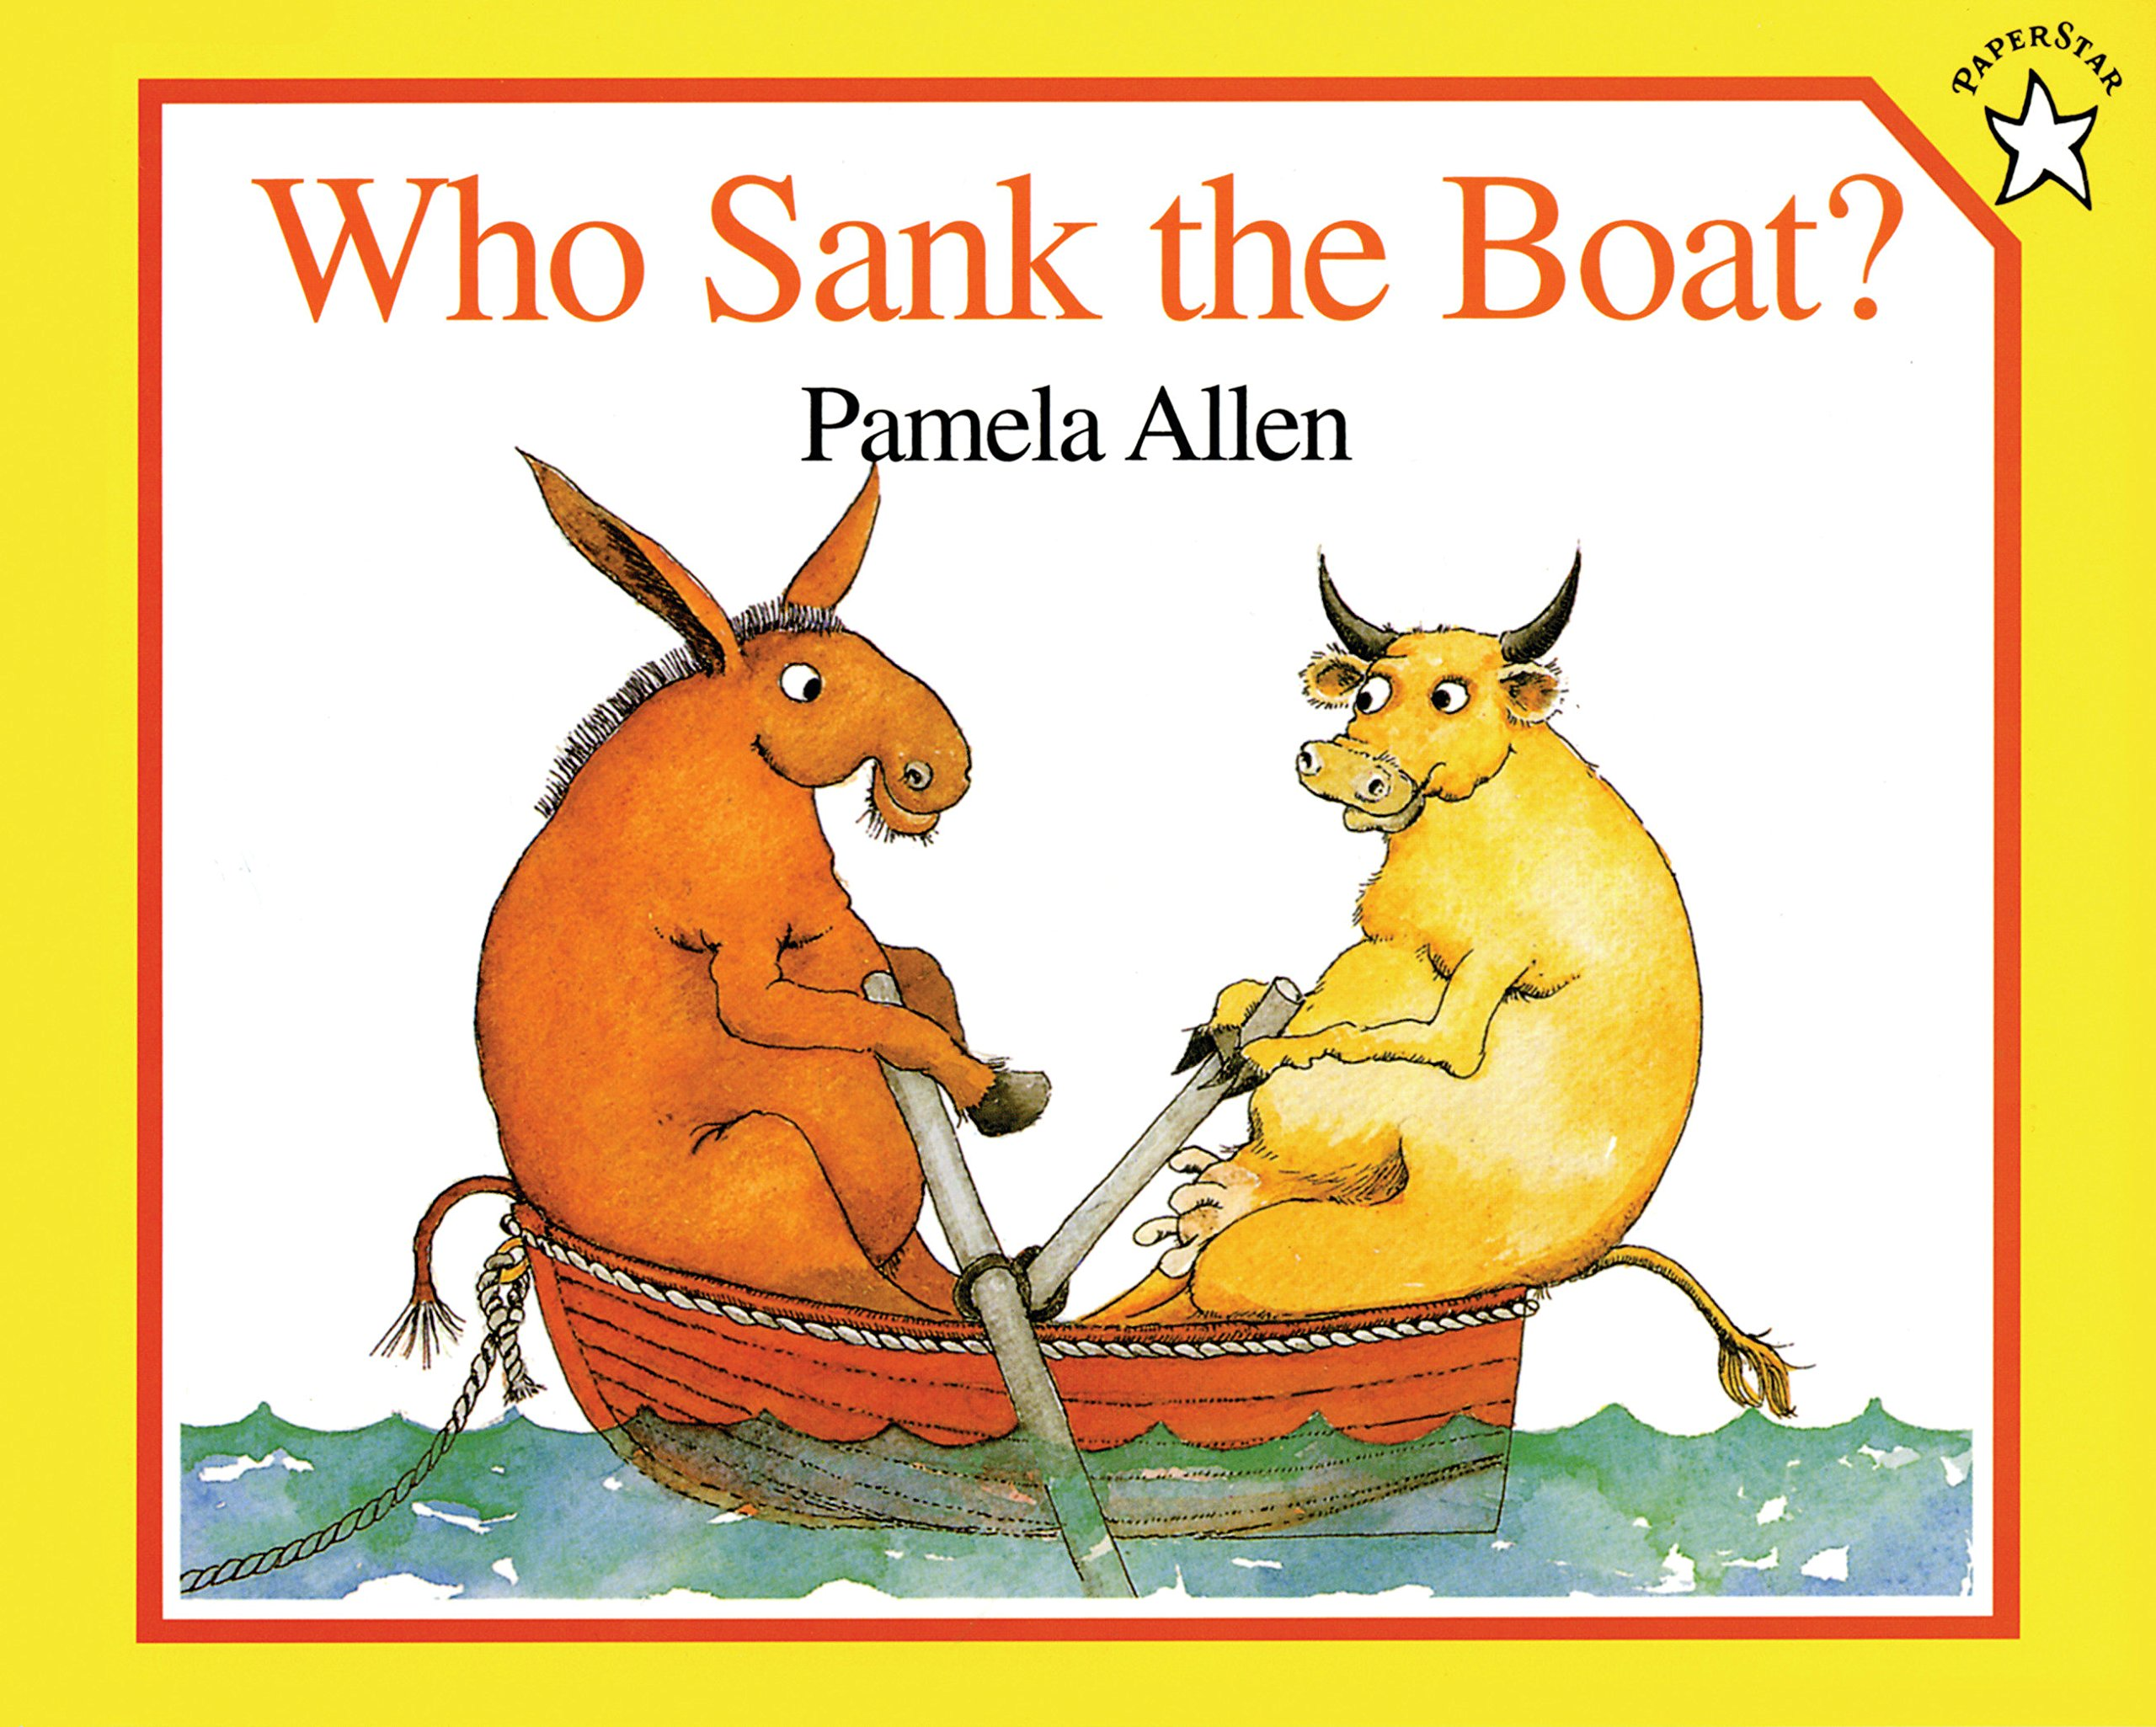 Who Sank the Boat? (Paperstar): Amazon.co.uk: Allen, Pamela: Books